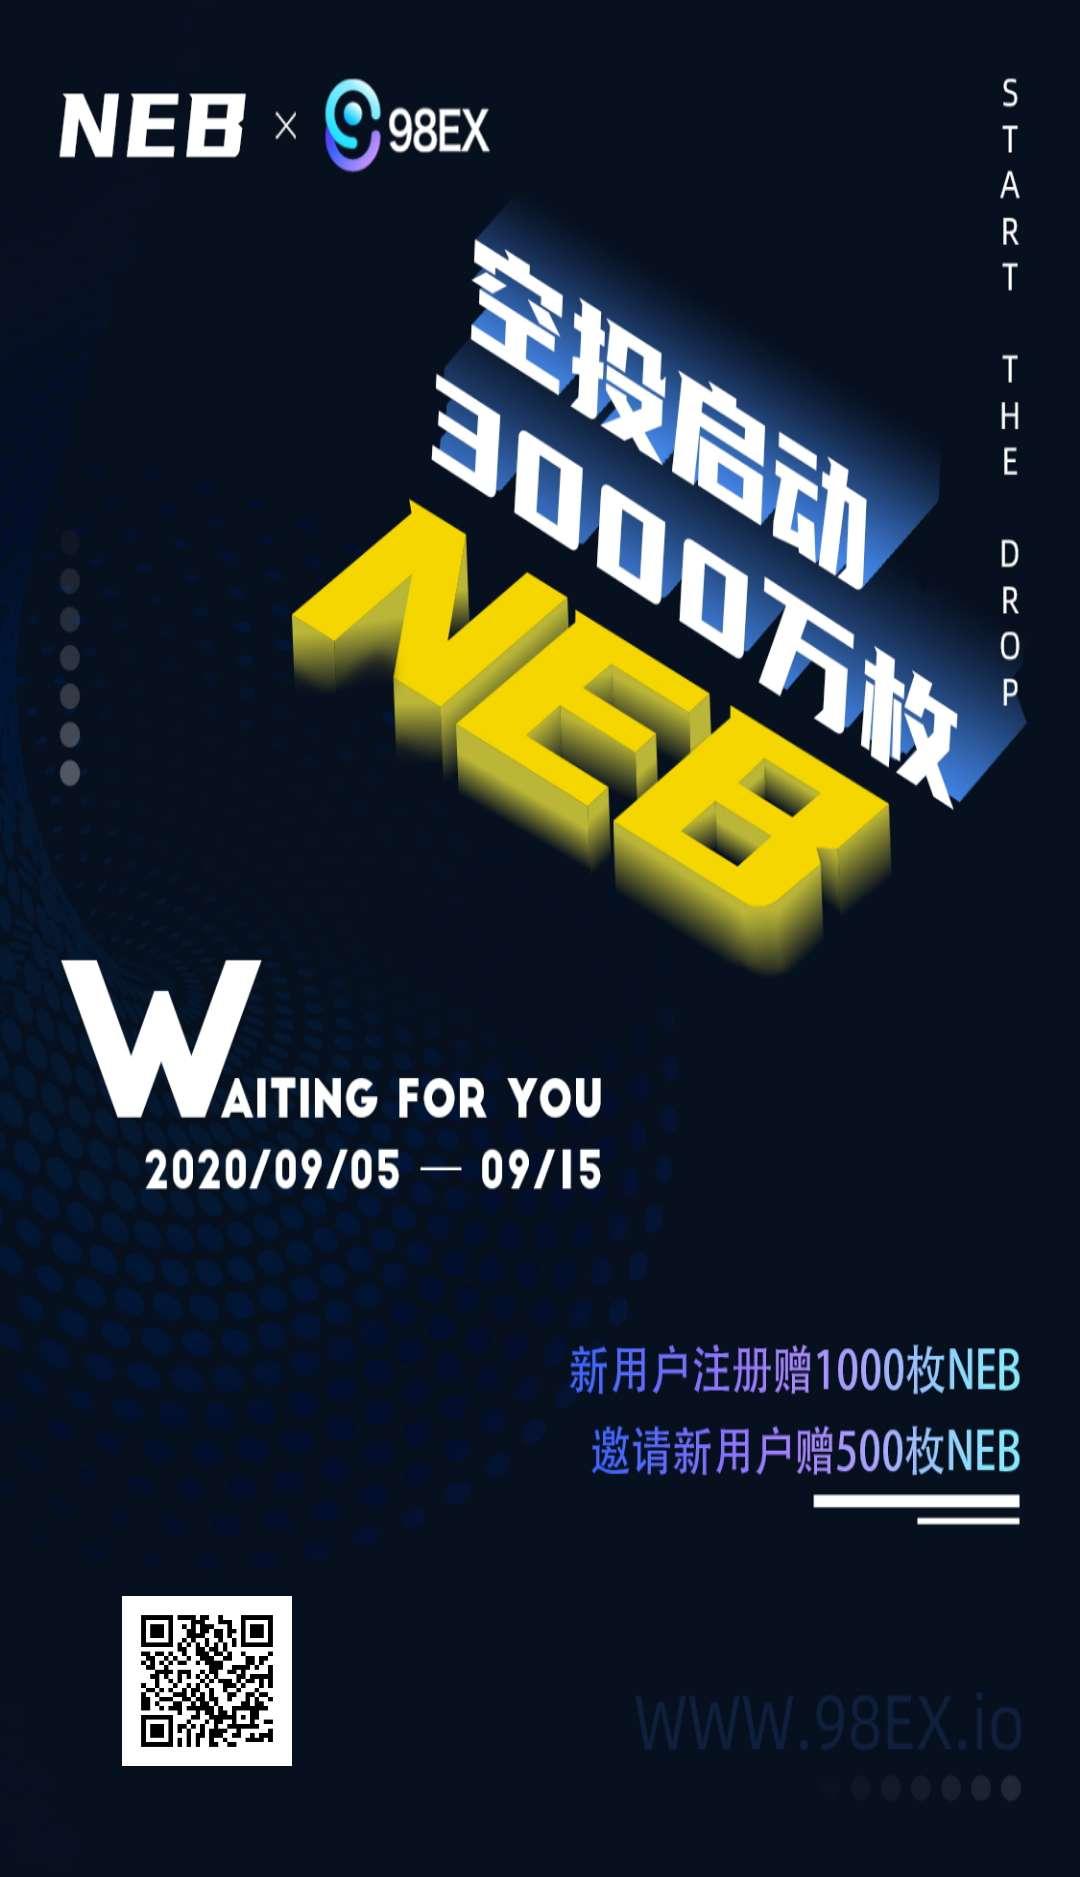 98EX-正在空投糖果,注册并认证,送NEB1000个,邀请再送500,15号可兑换